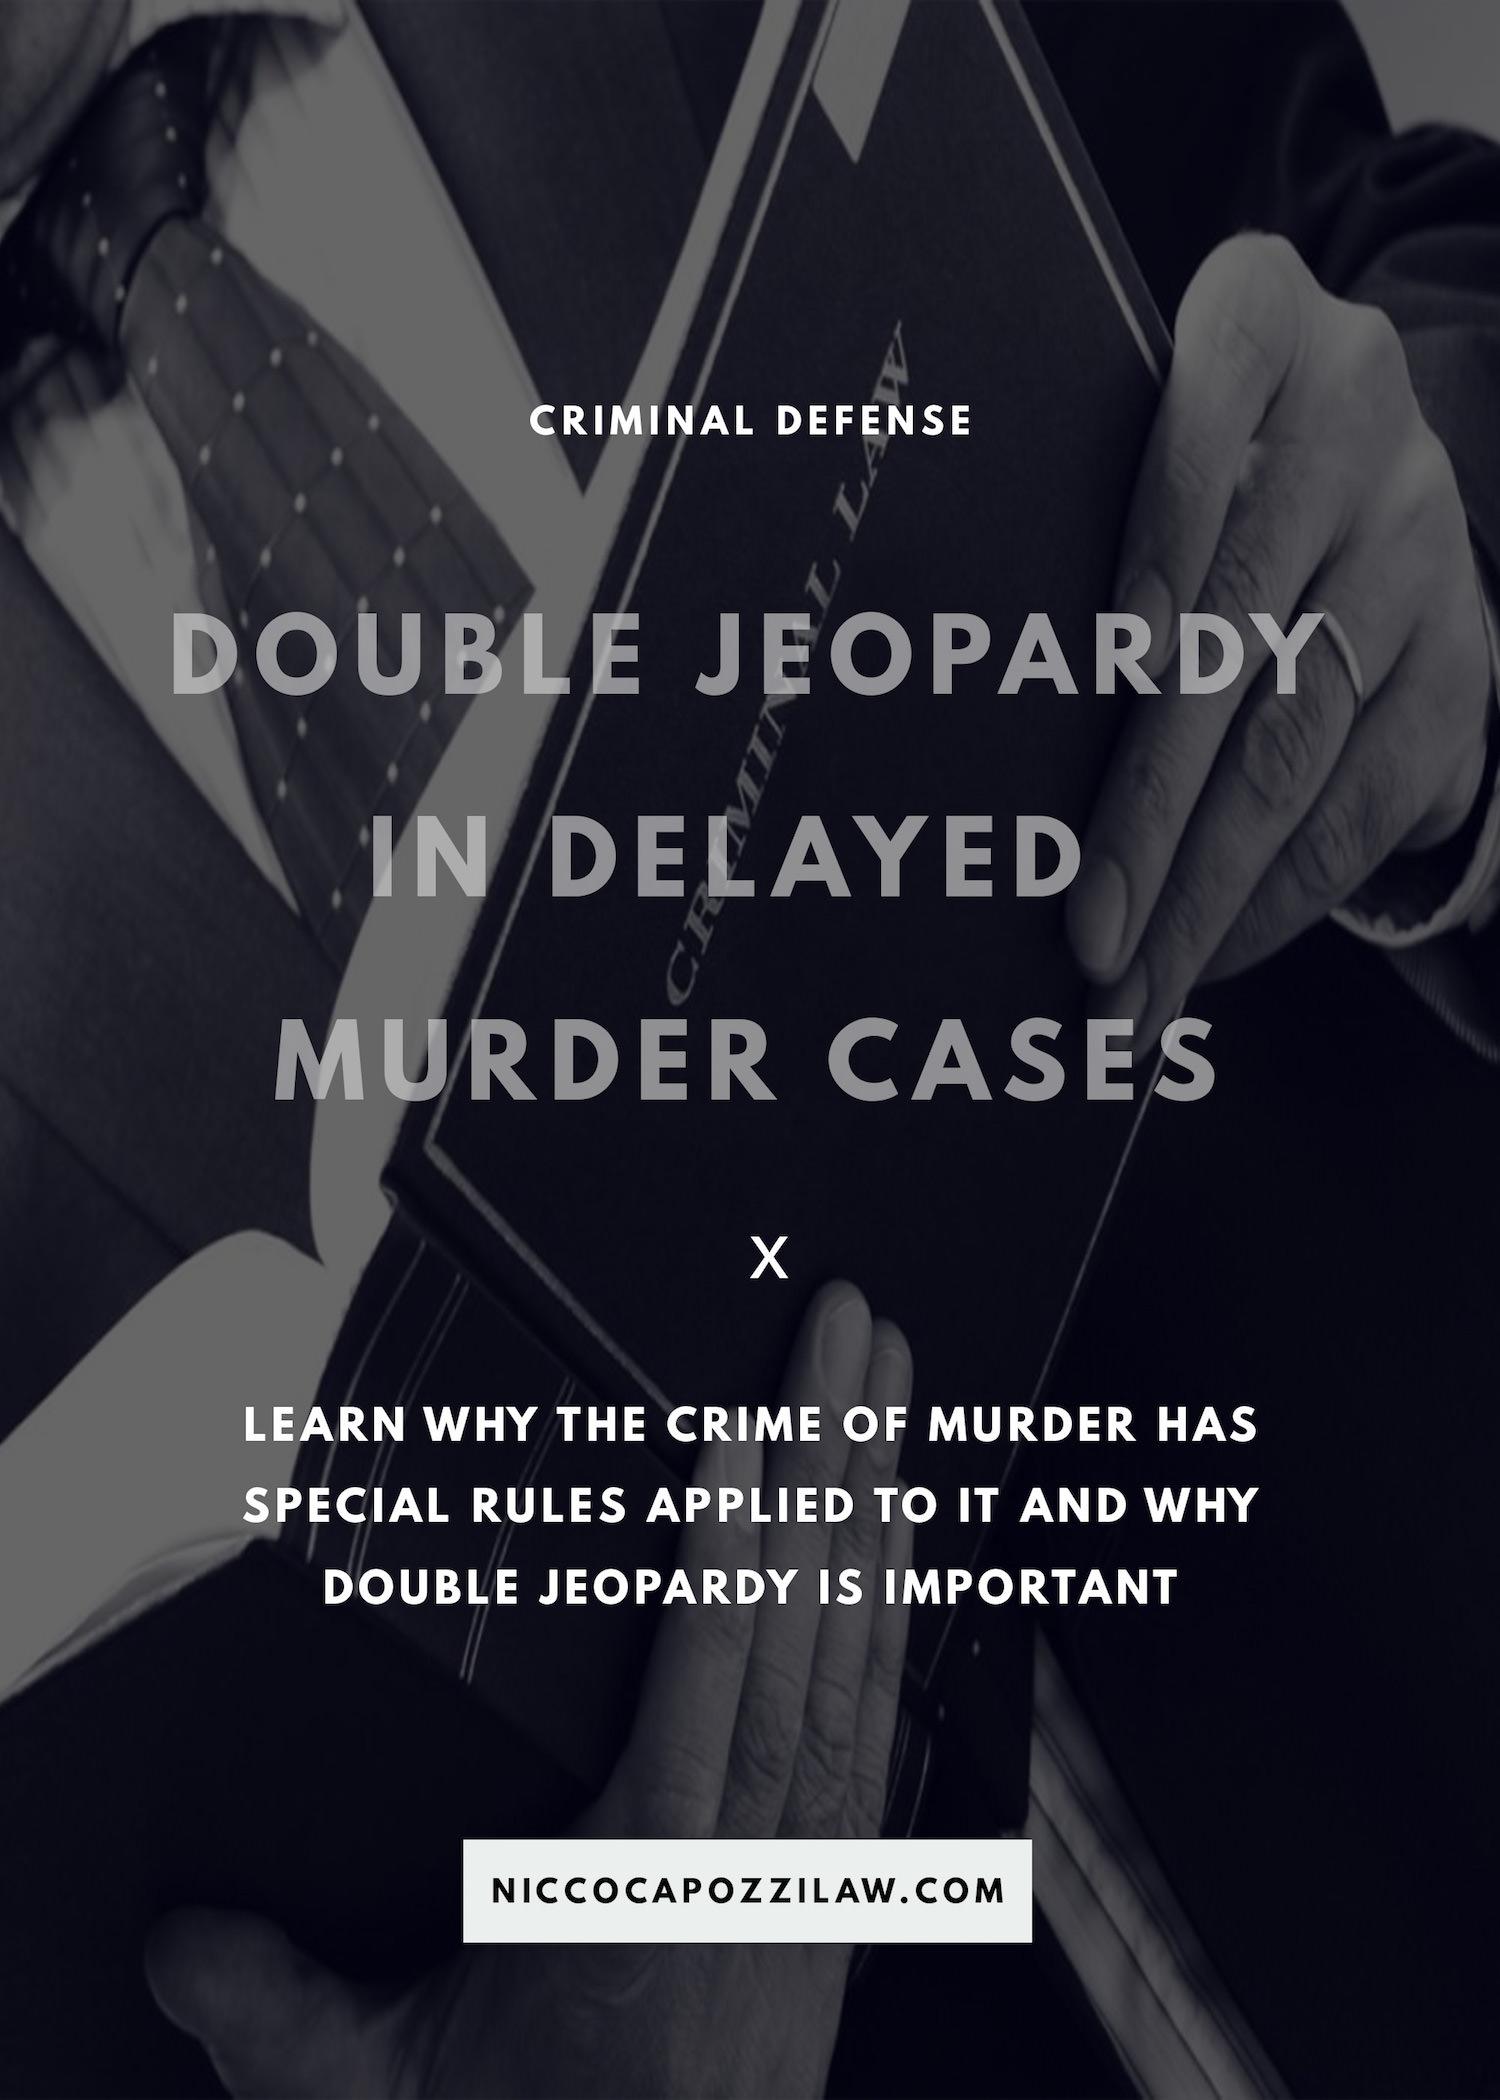 double jeopardy in delayed murder cases.jpg